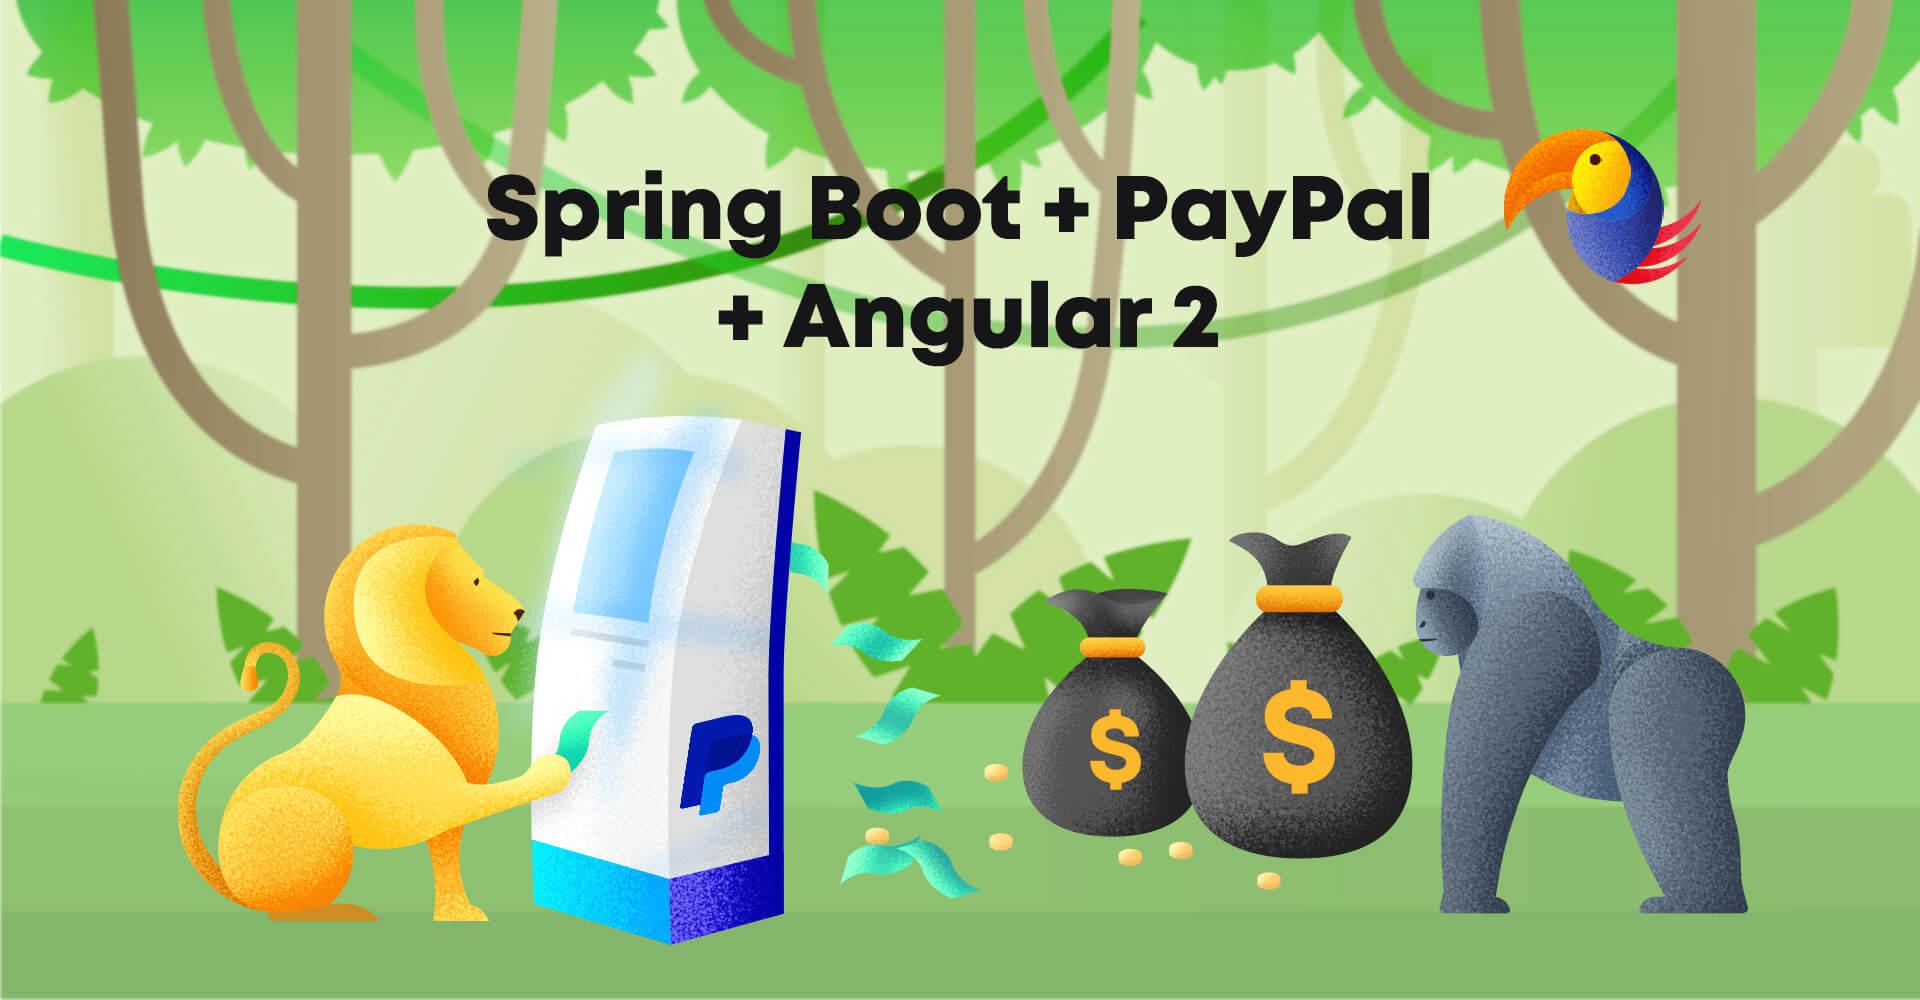 Spring Boot + PayPal + Angular 2